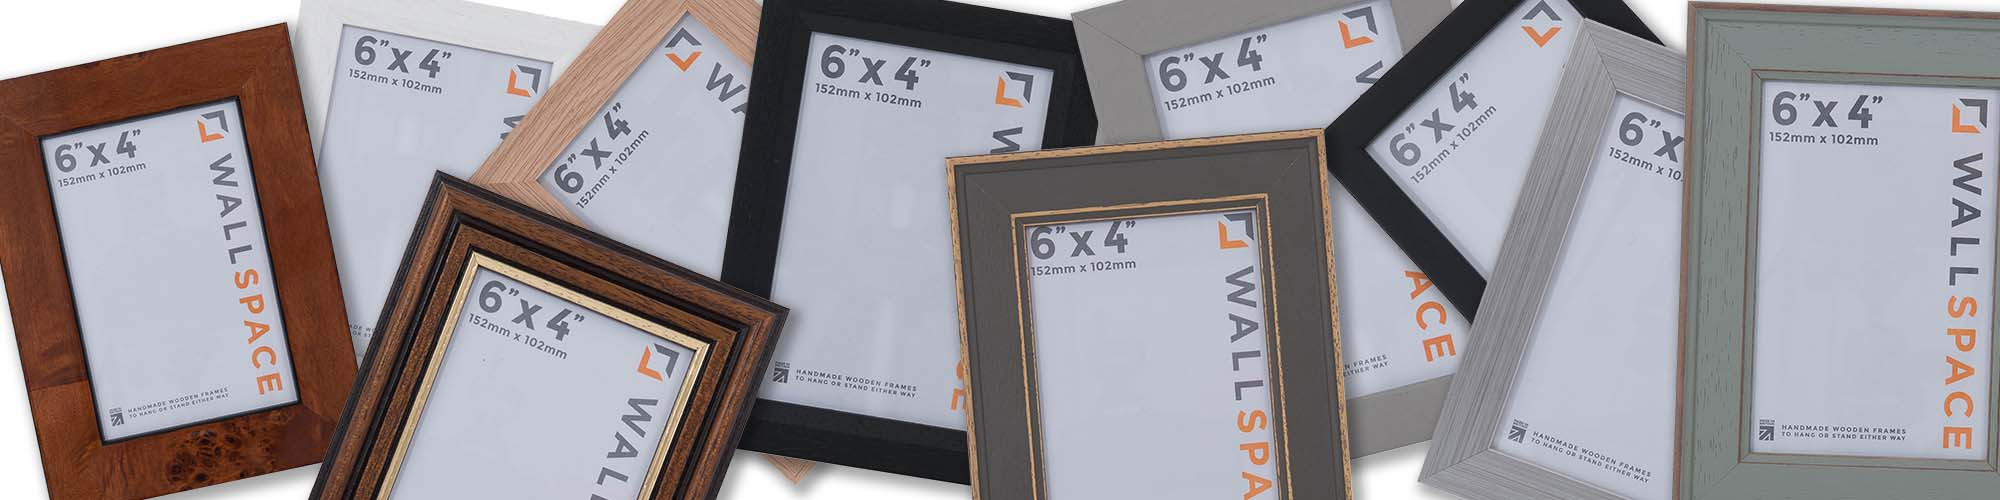 "6"" x 4"" Photo Frames"